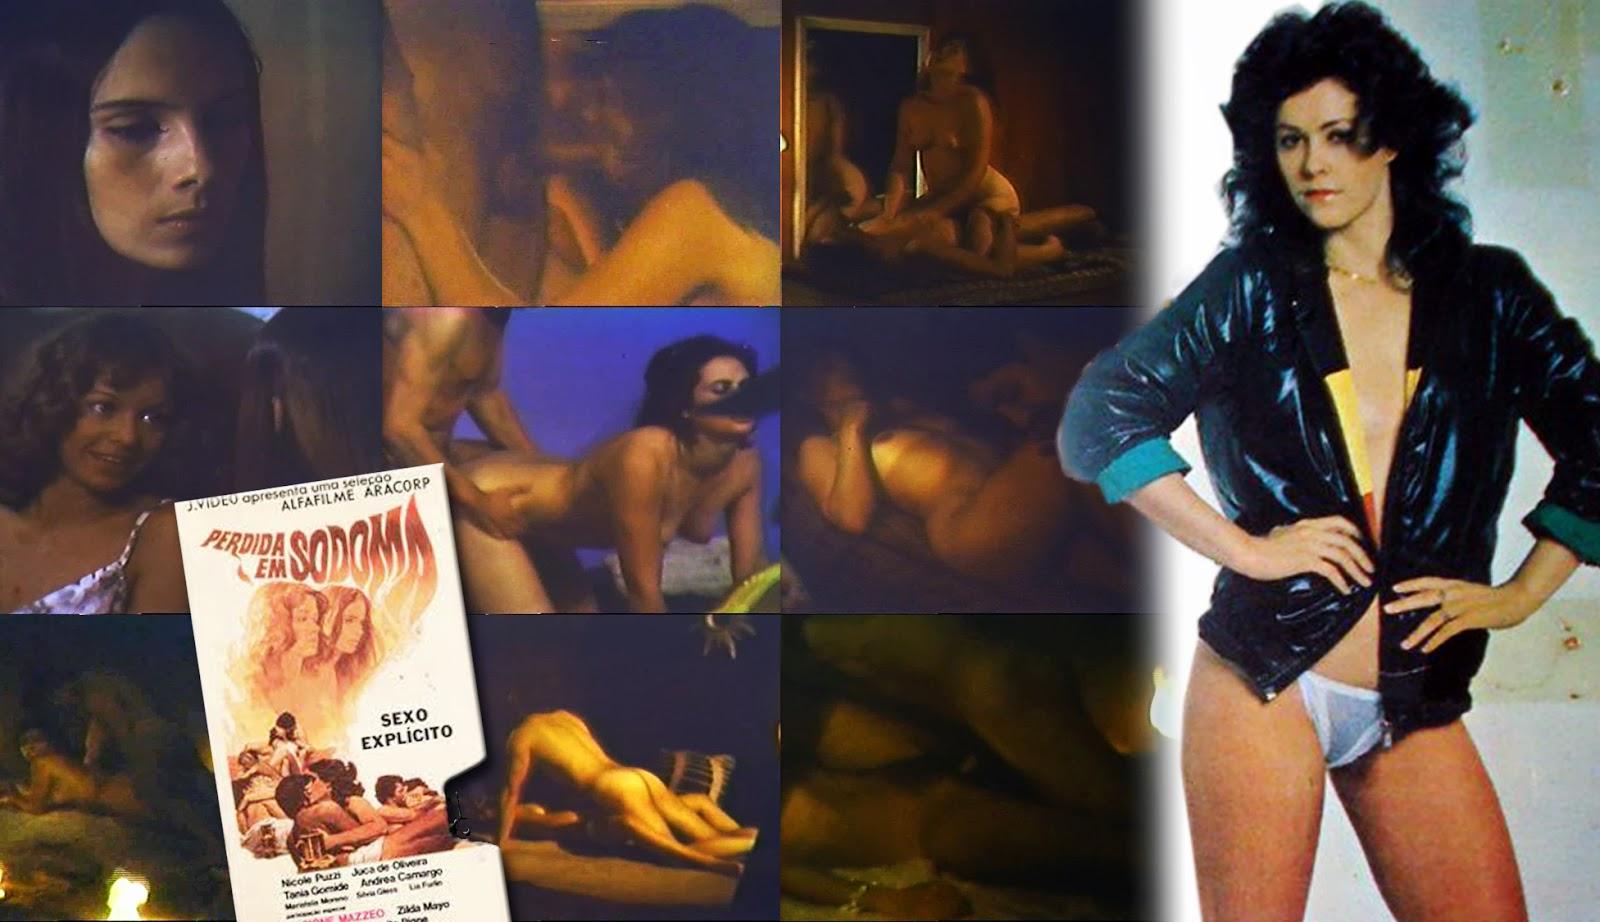 baixar Perdida em Sodoma (1982) download